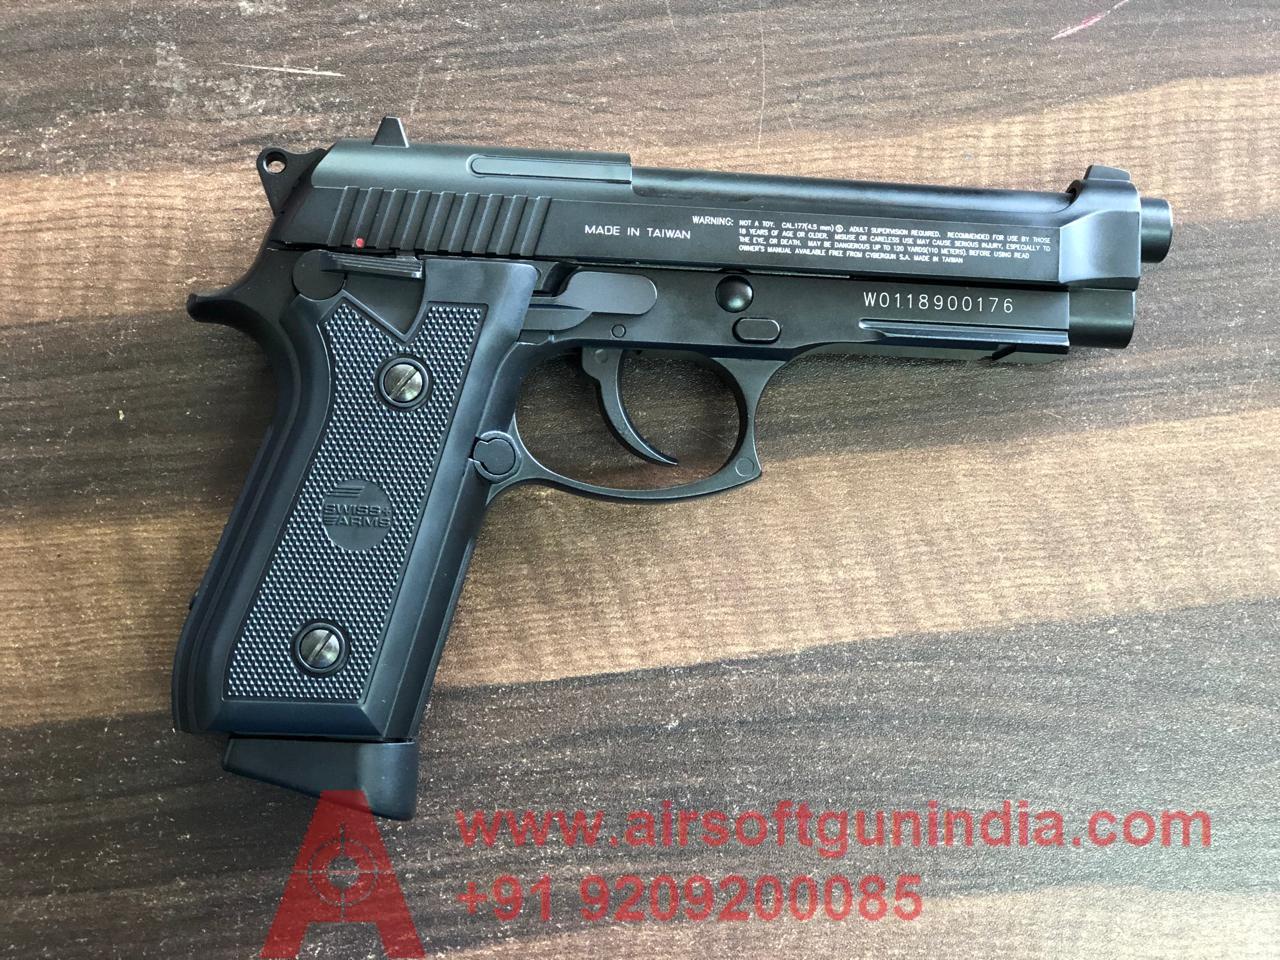 Beretta M9 Style Swiss Arms P92 CO2 Pistol